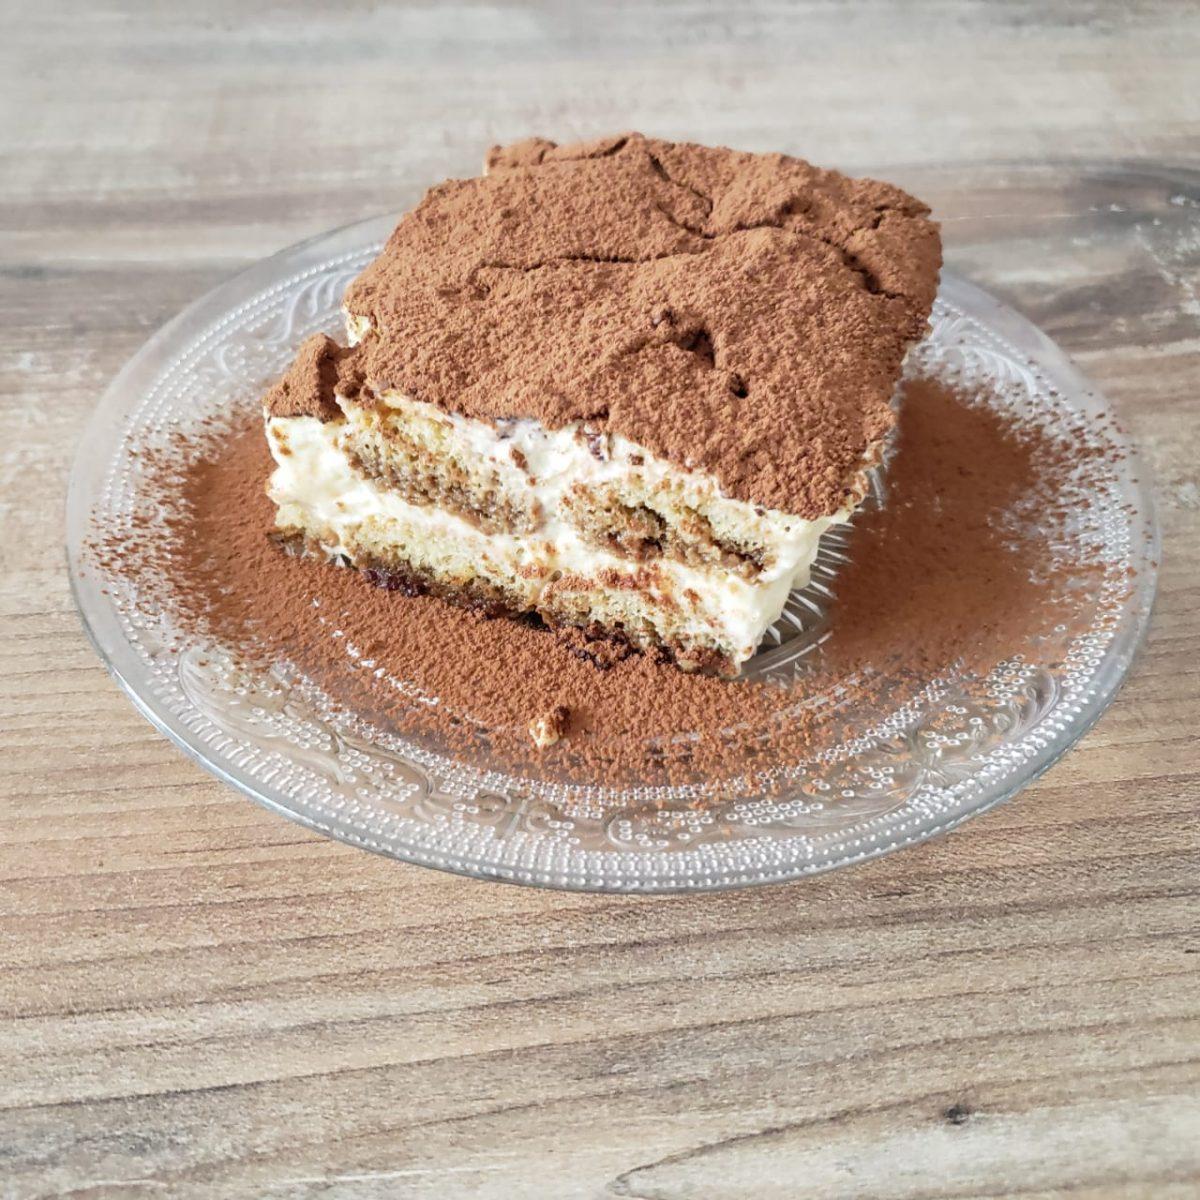 Tiramisu recipe from Italy!